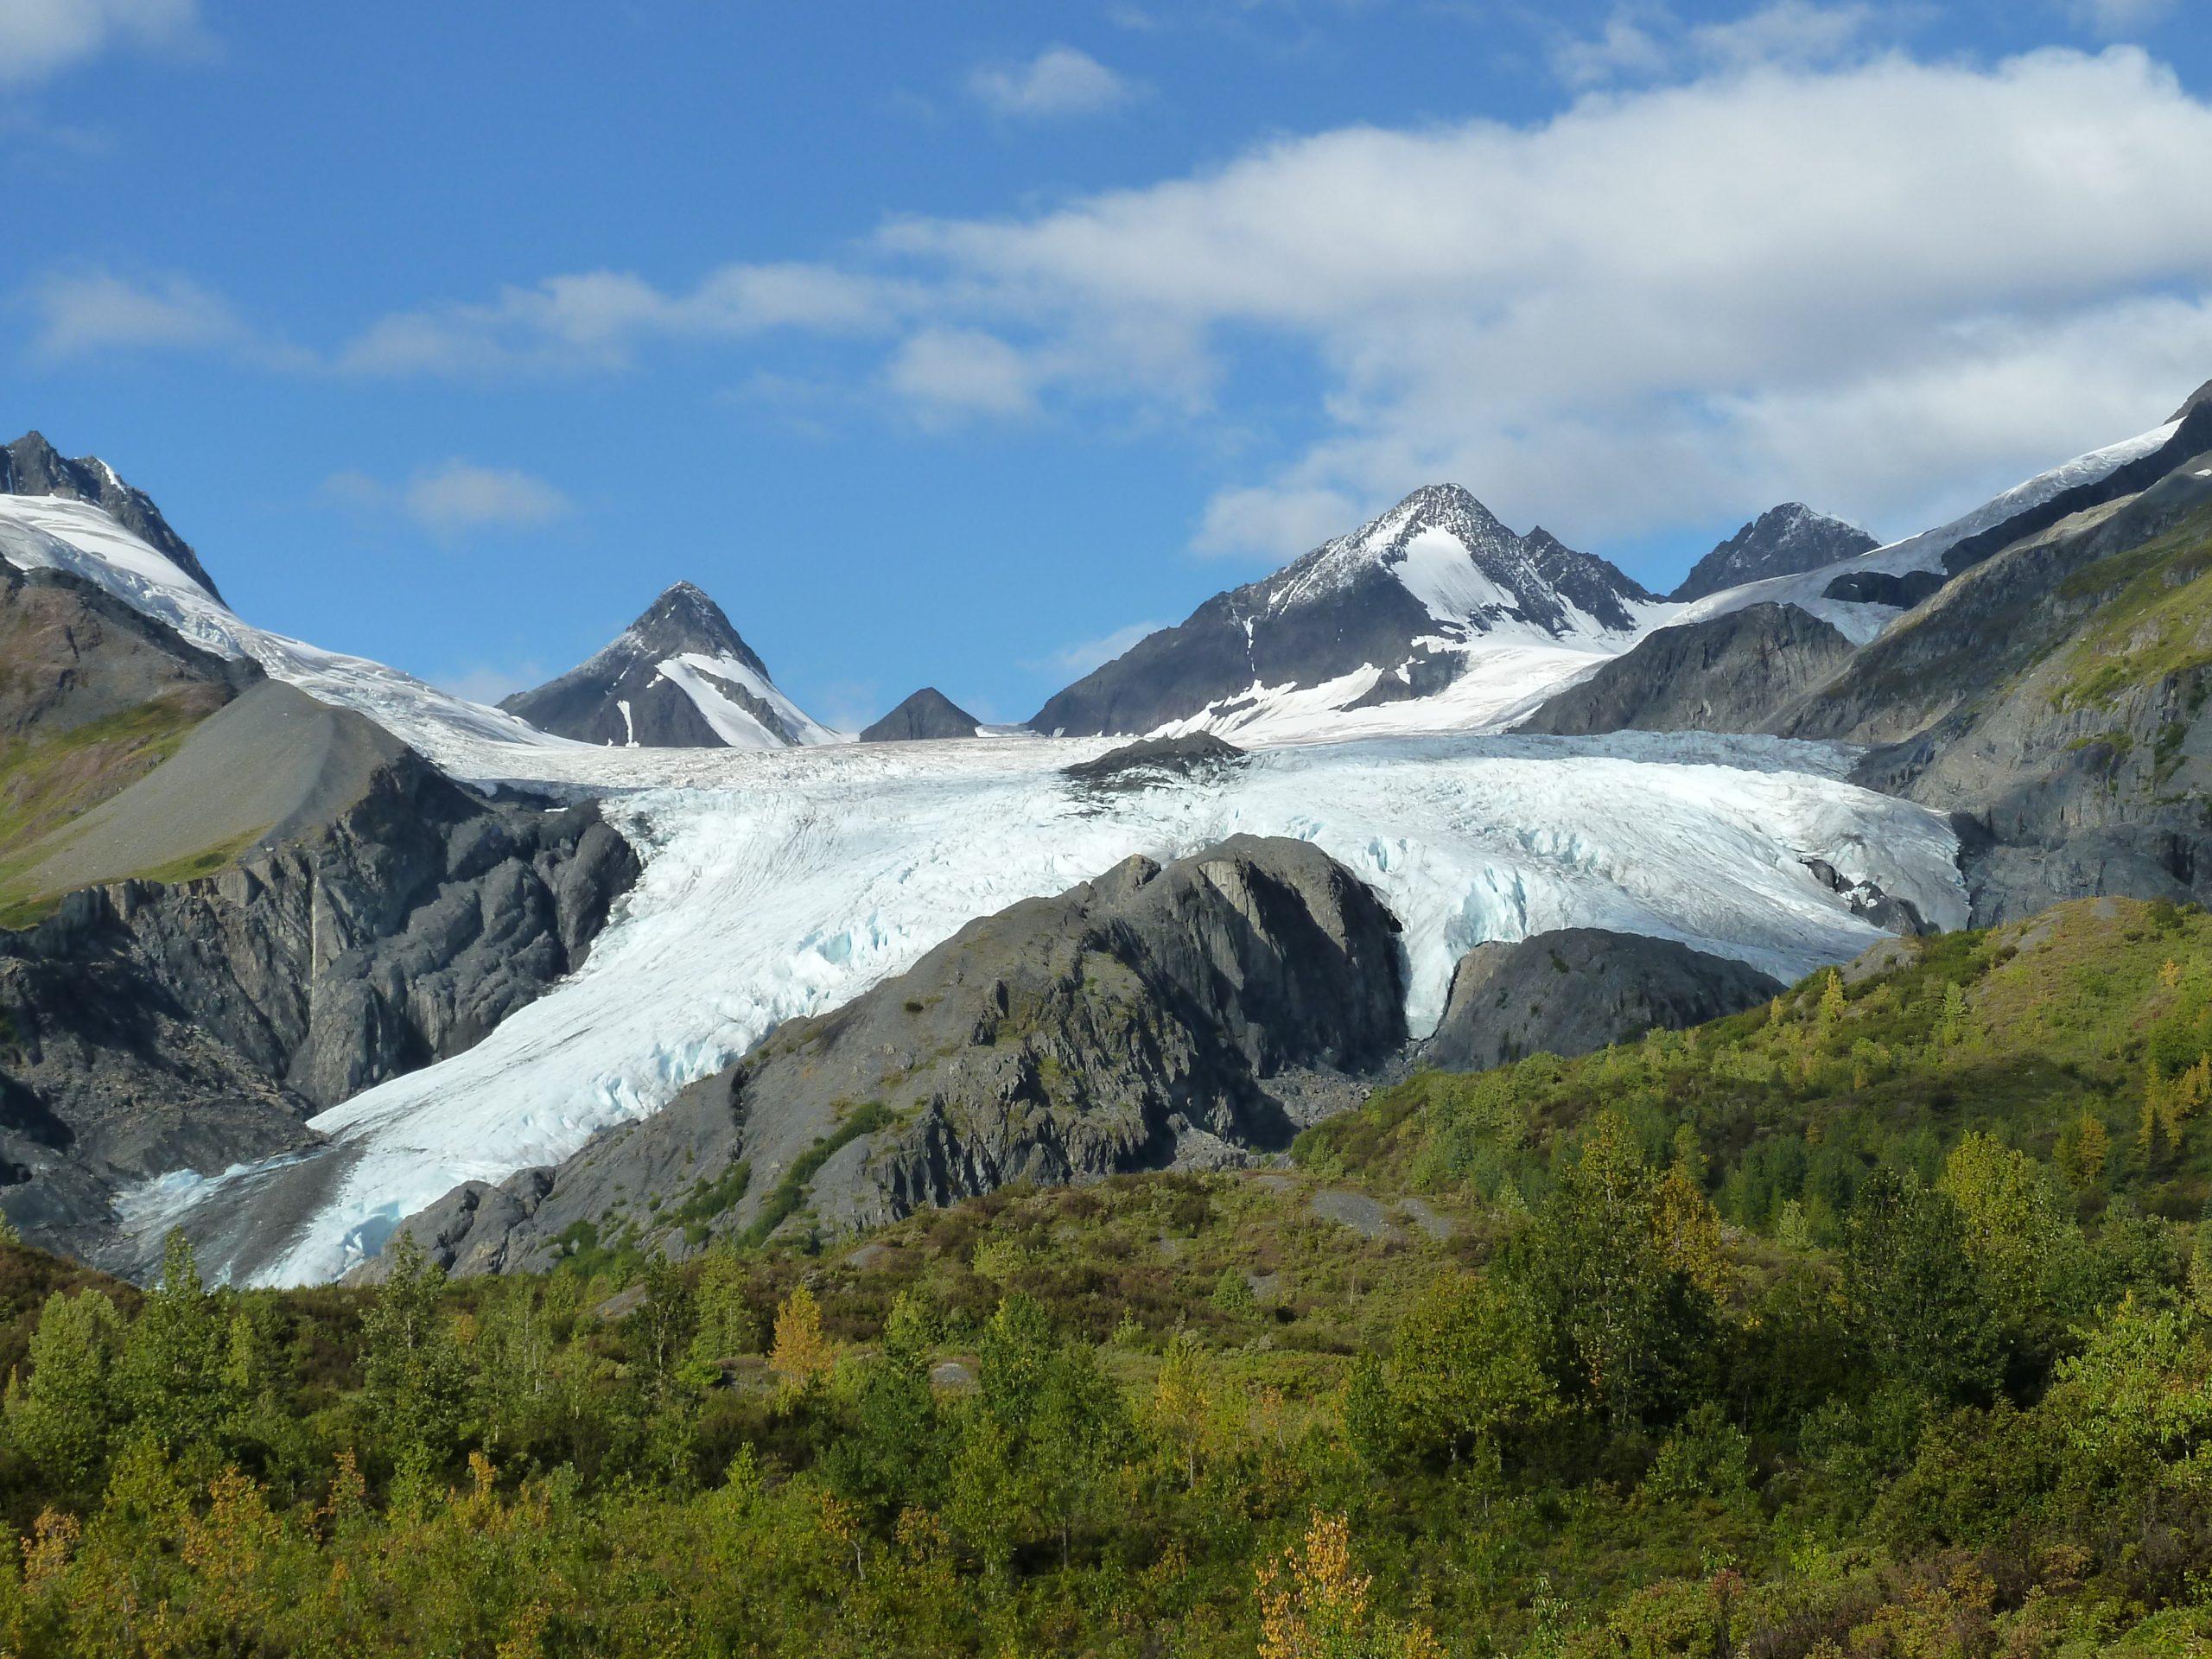 Radreise Alaska 2010 - Worthington Glacier